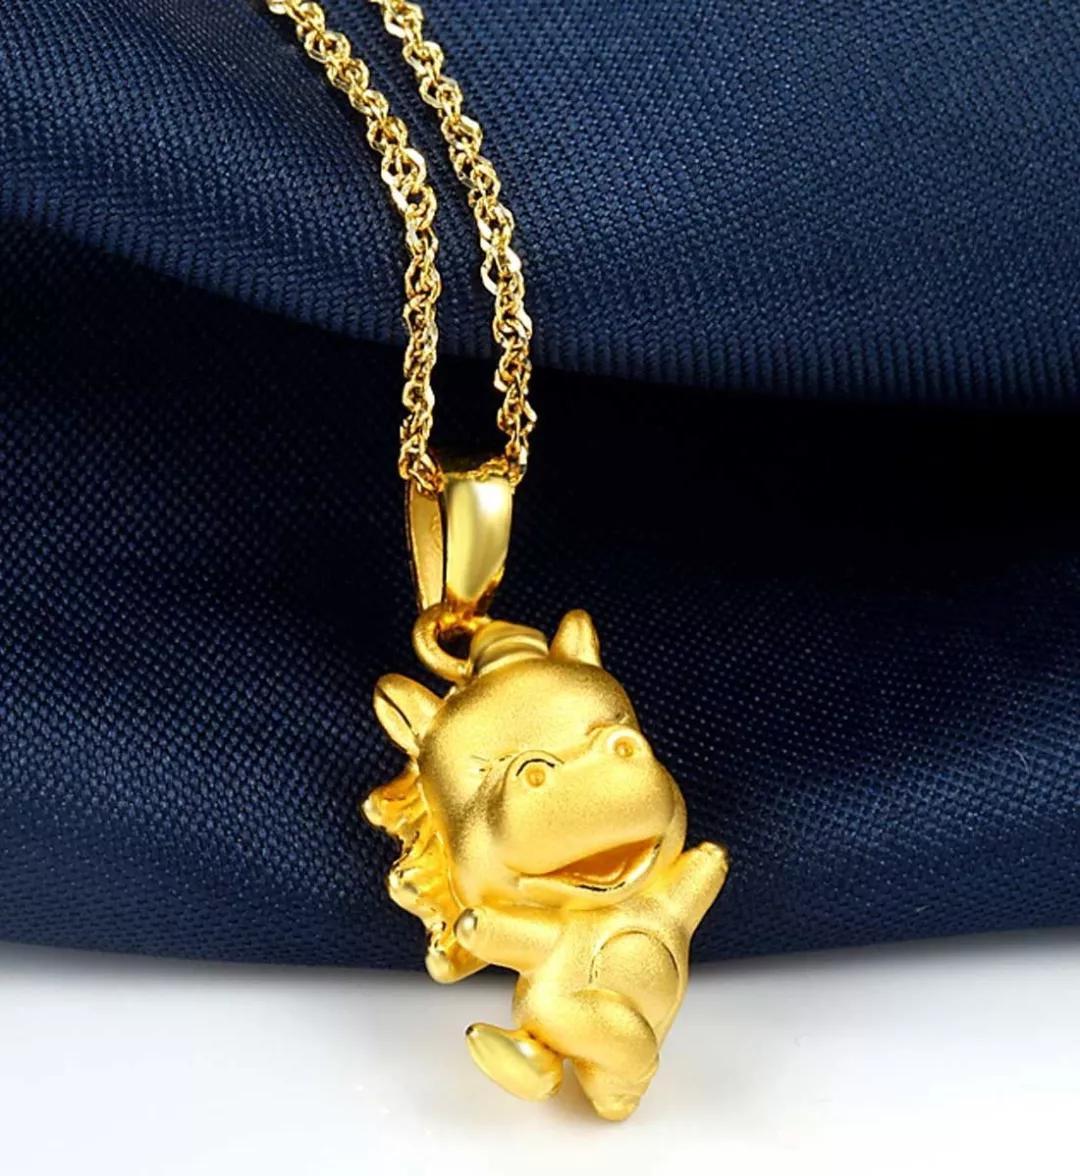 3D硬金为什么不能等价换购普通黄金饰品?